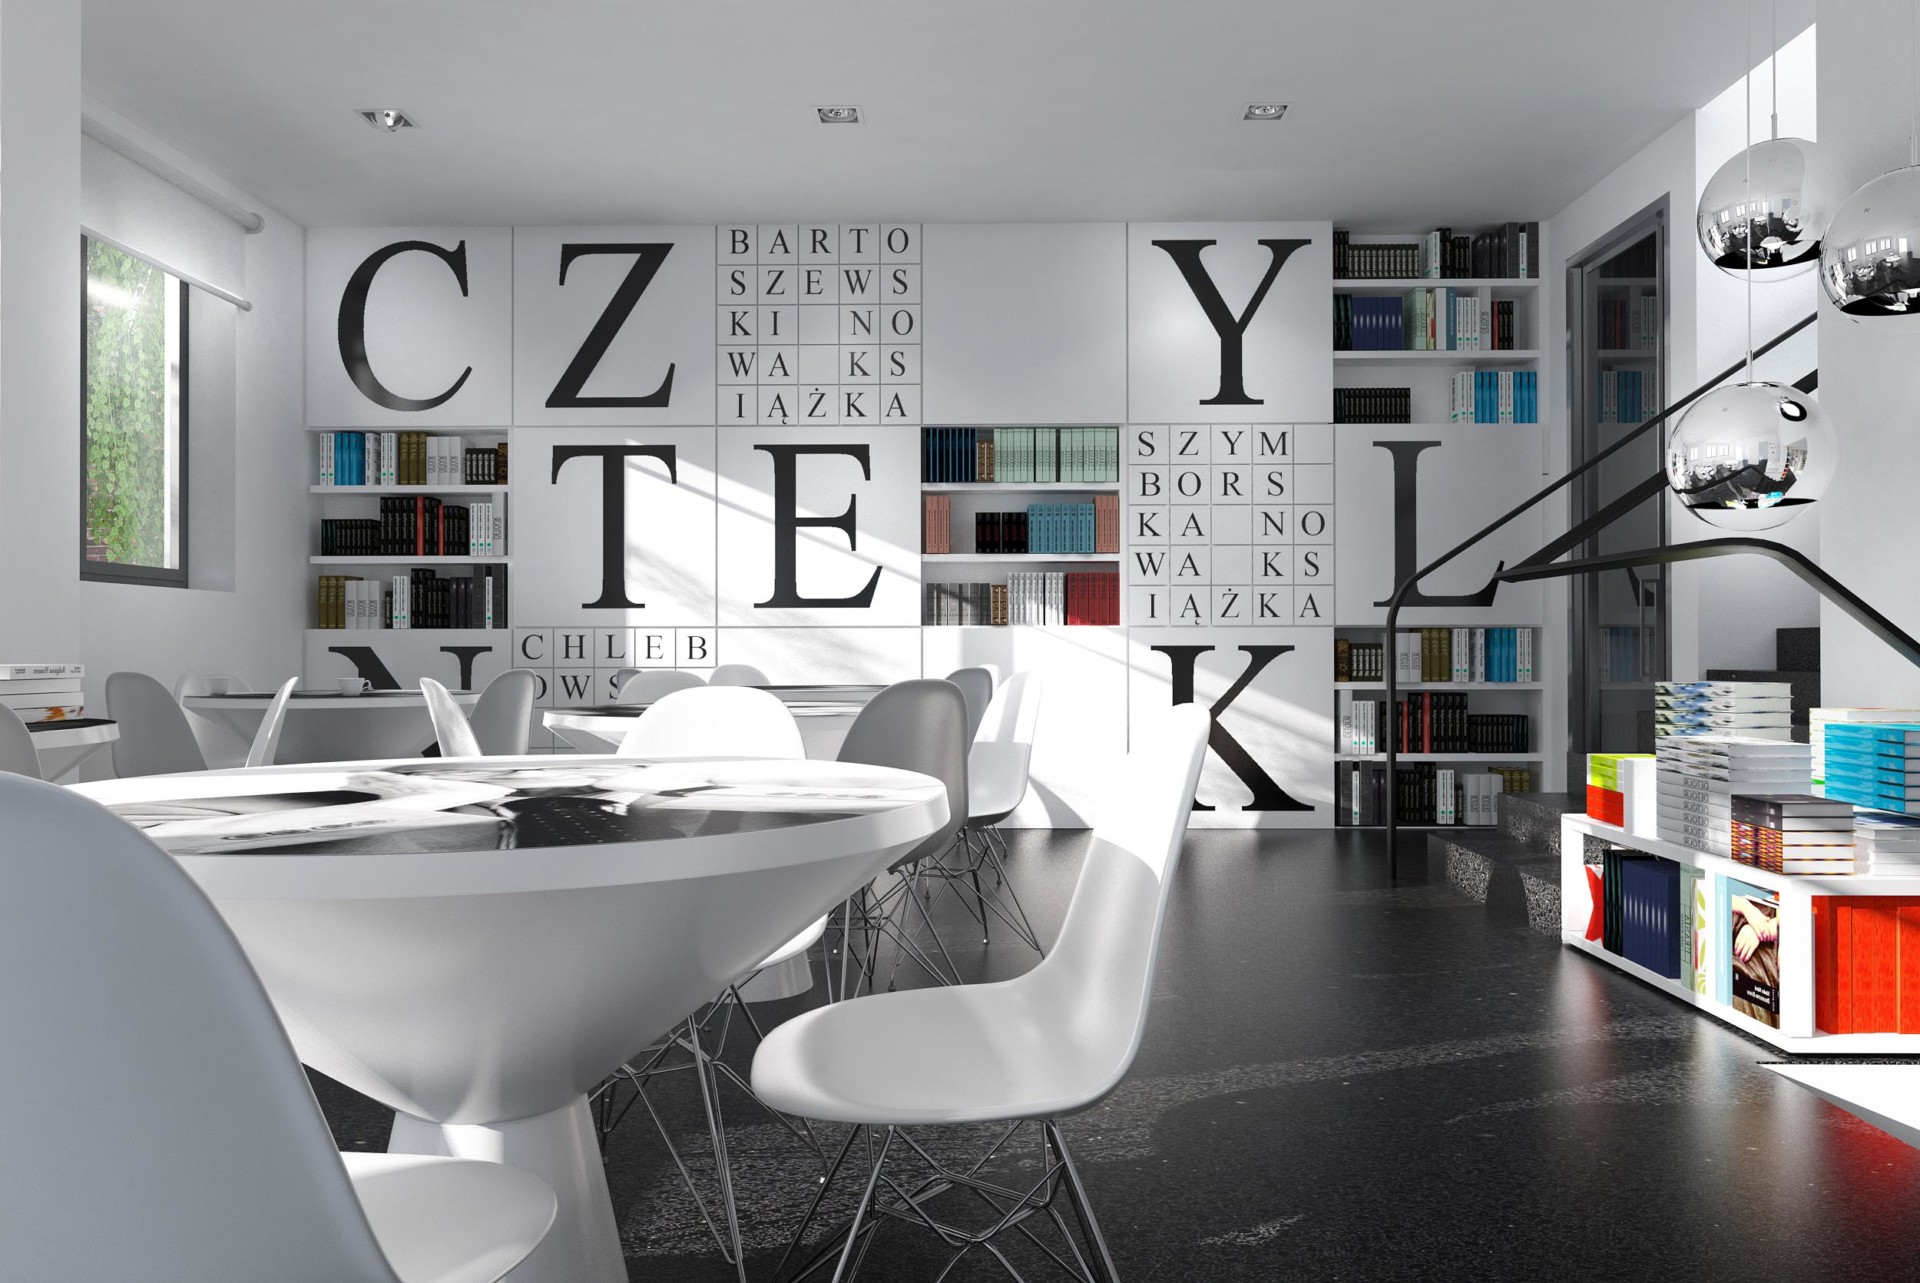 Kint Studio english Czytelnik Bookstore